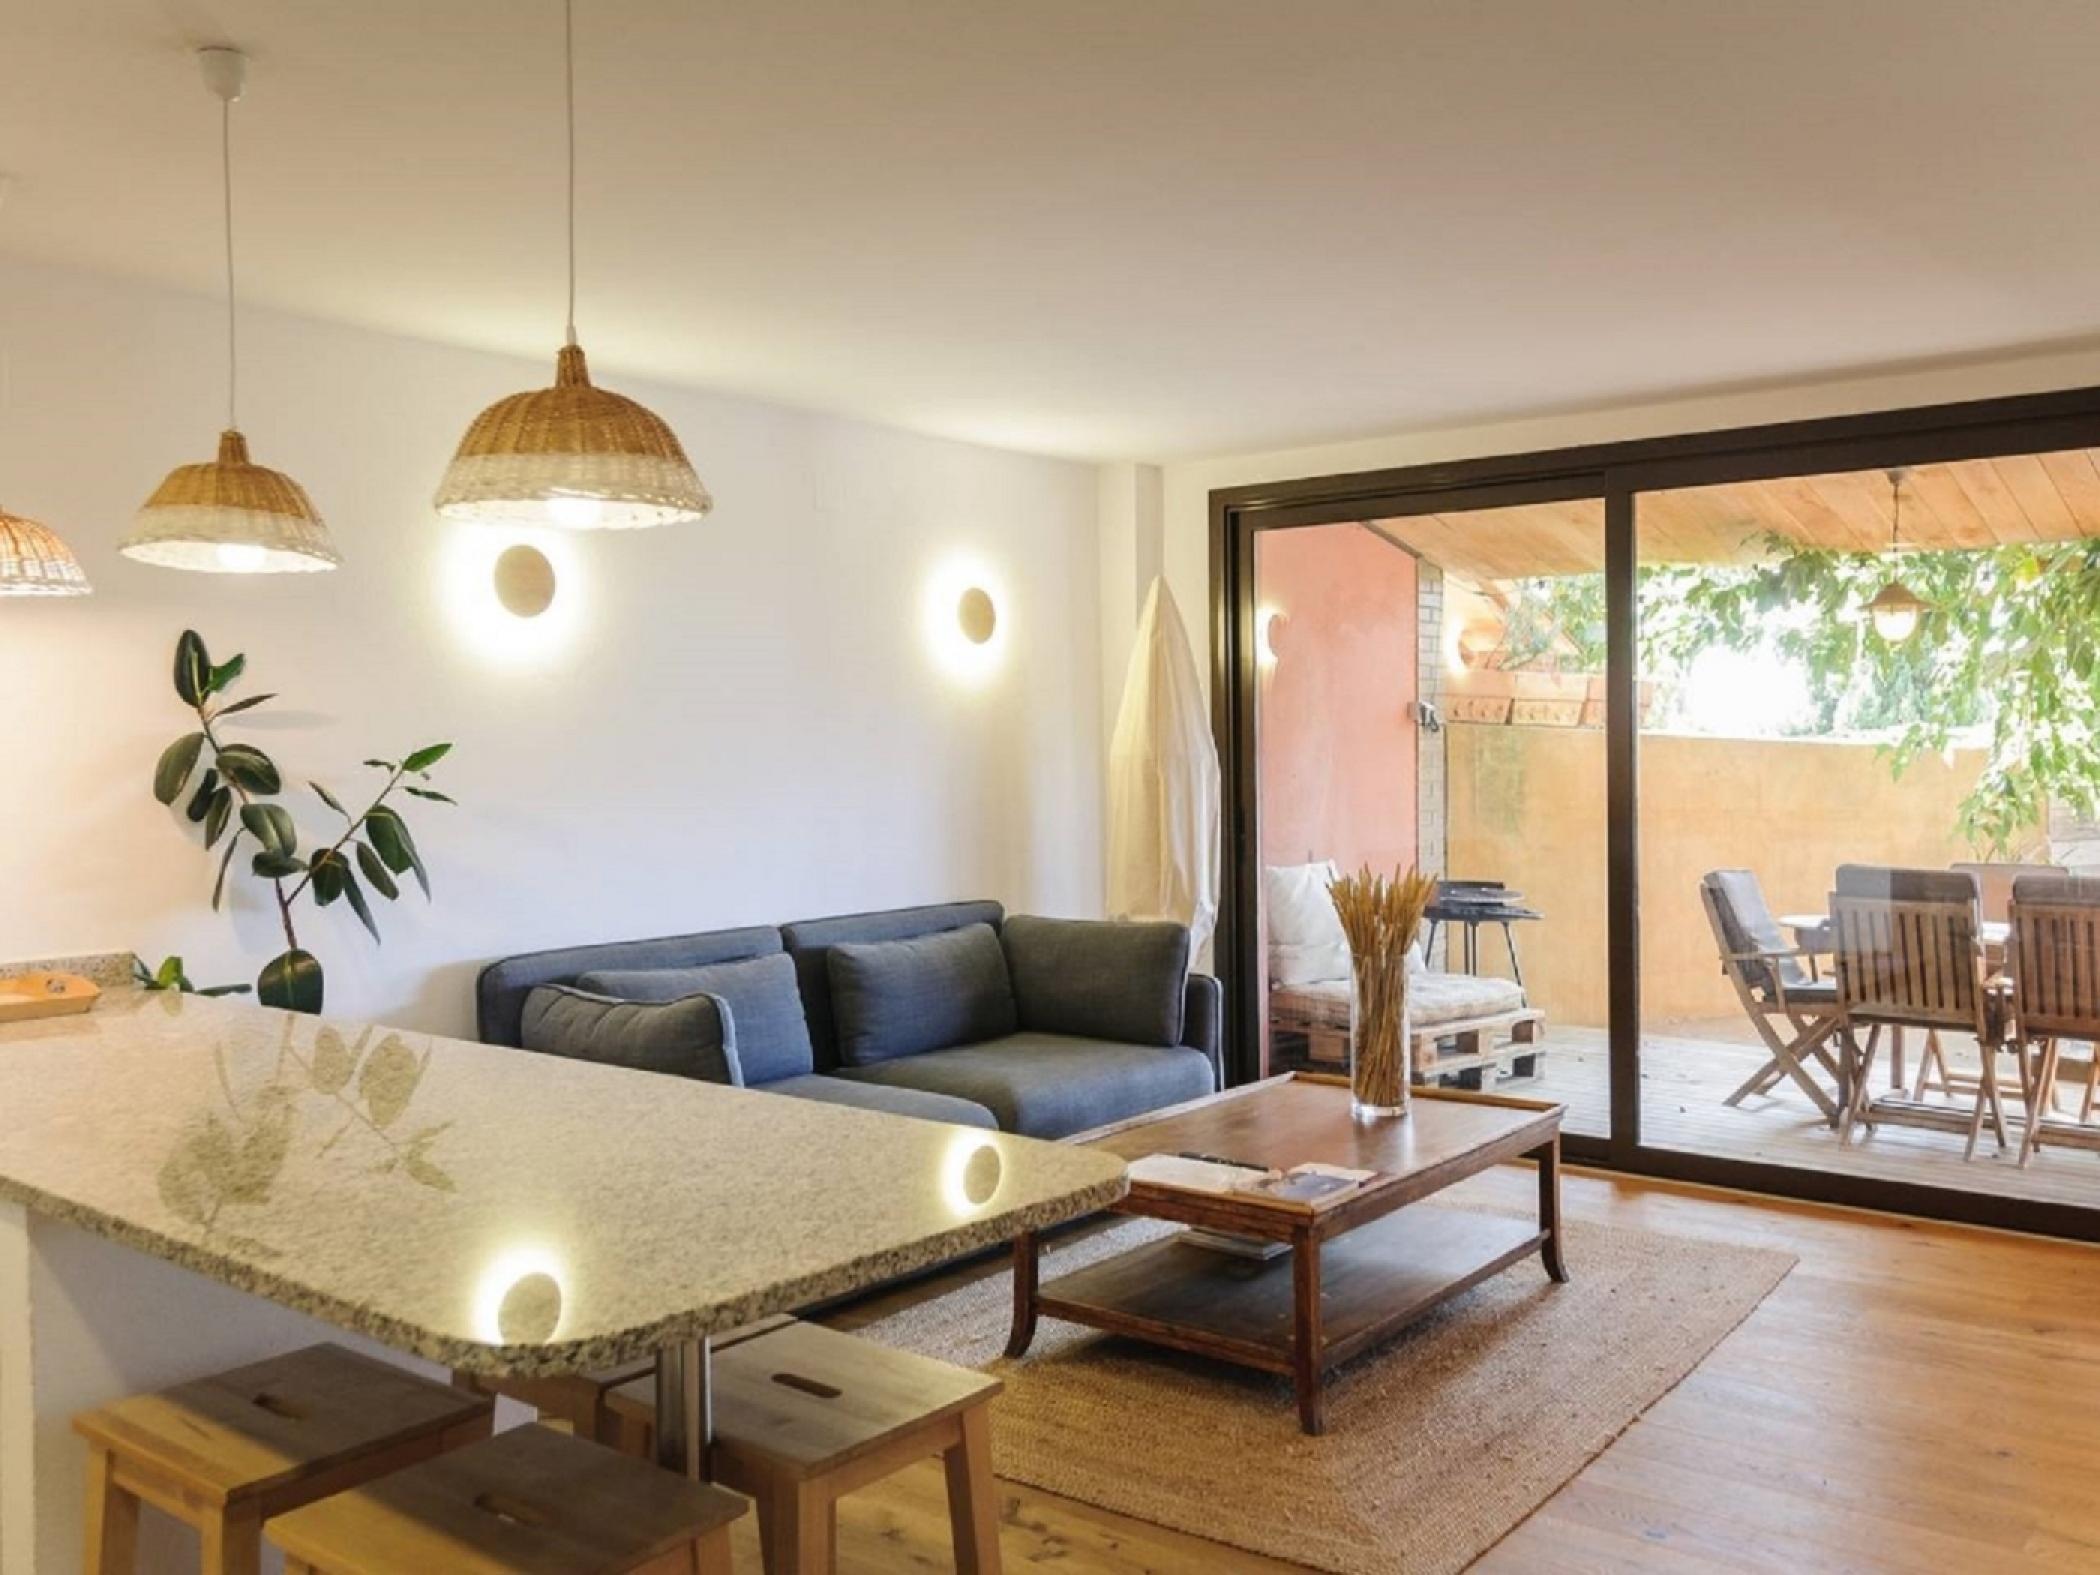 Meuble Salle De Bain Girona louer villa avec piscine à sant jordi desvalls - casa rustica en sant jordi  desvalls cal nin